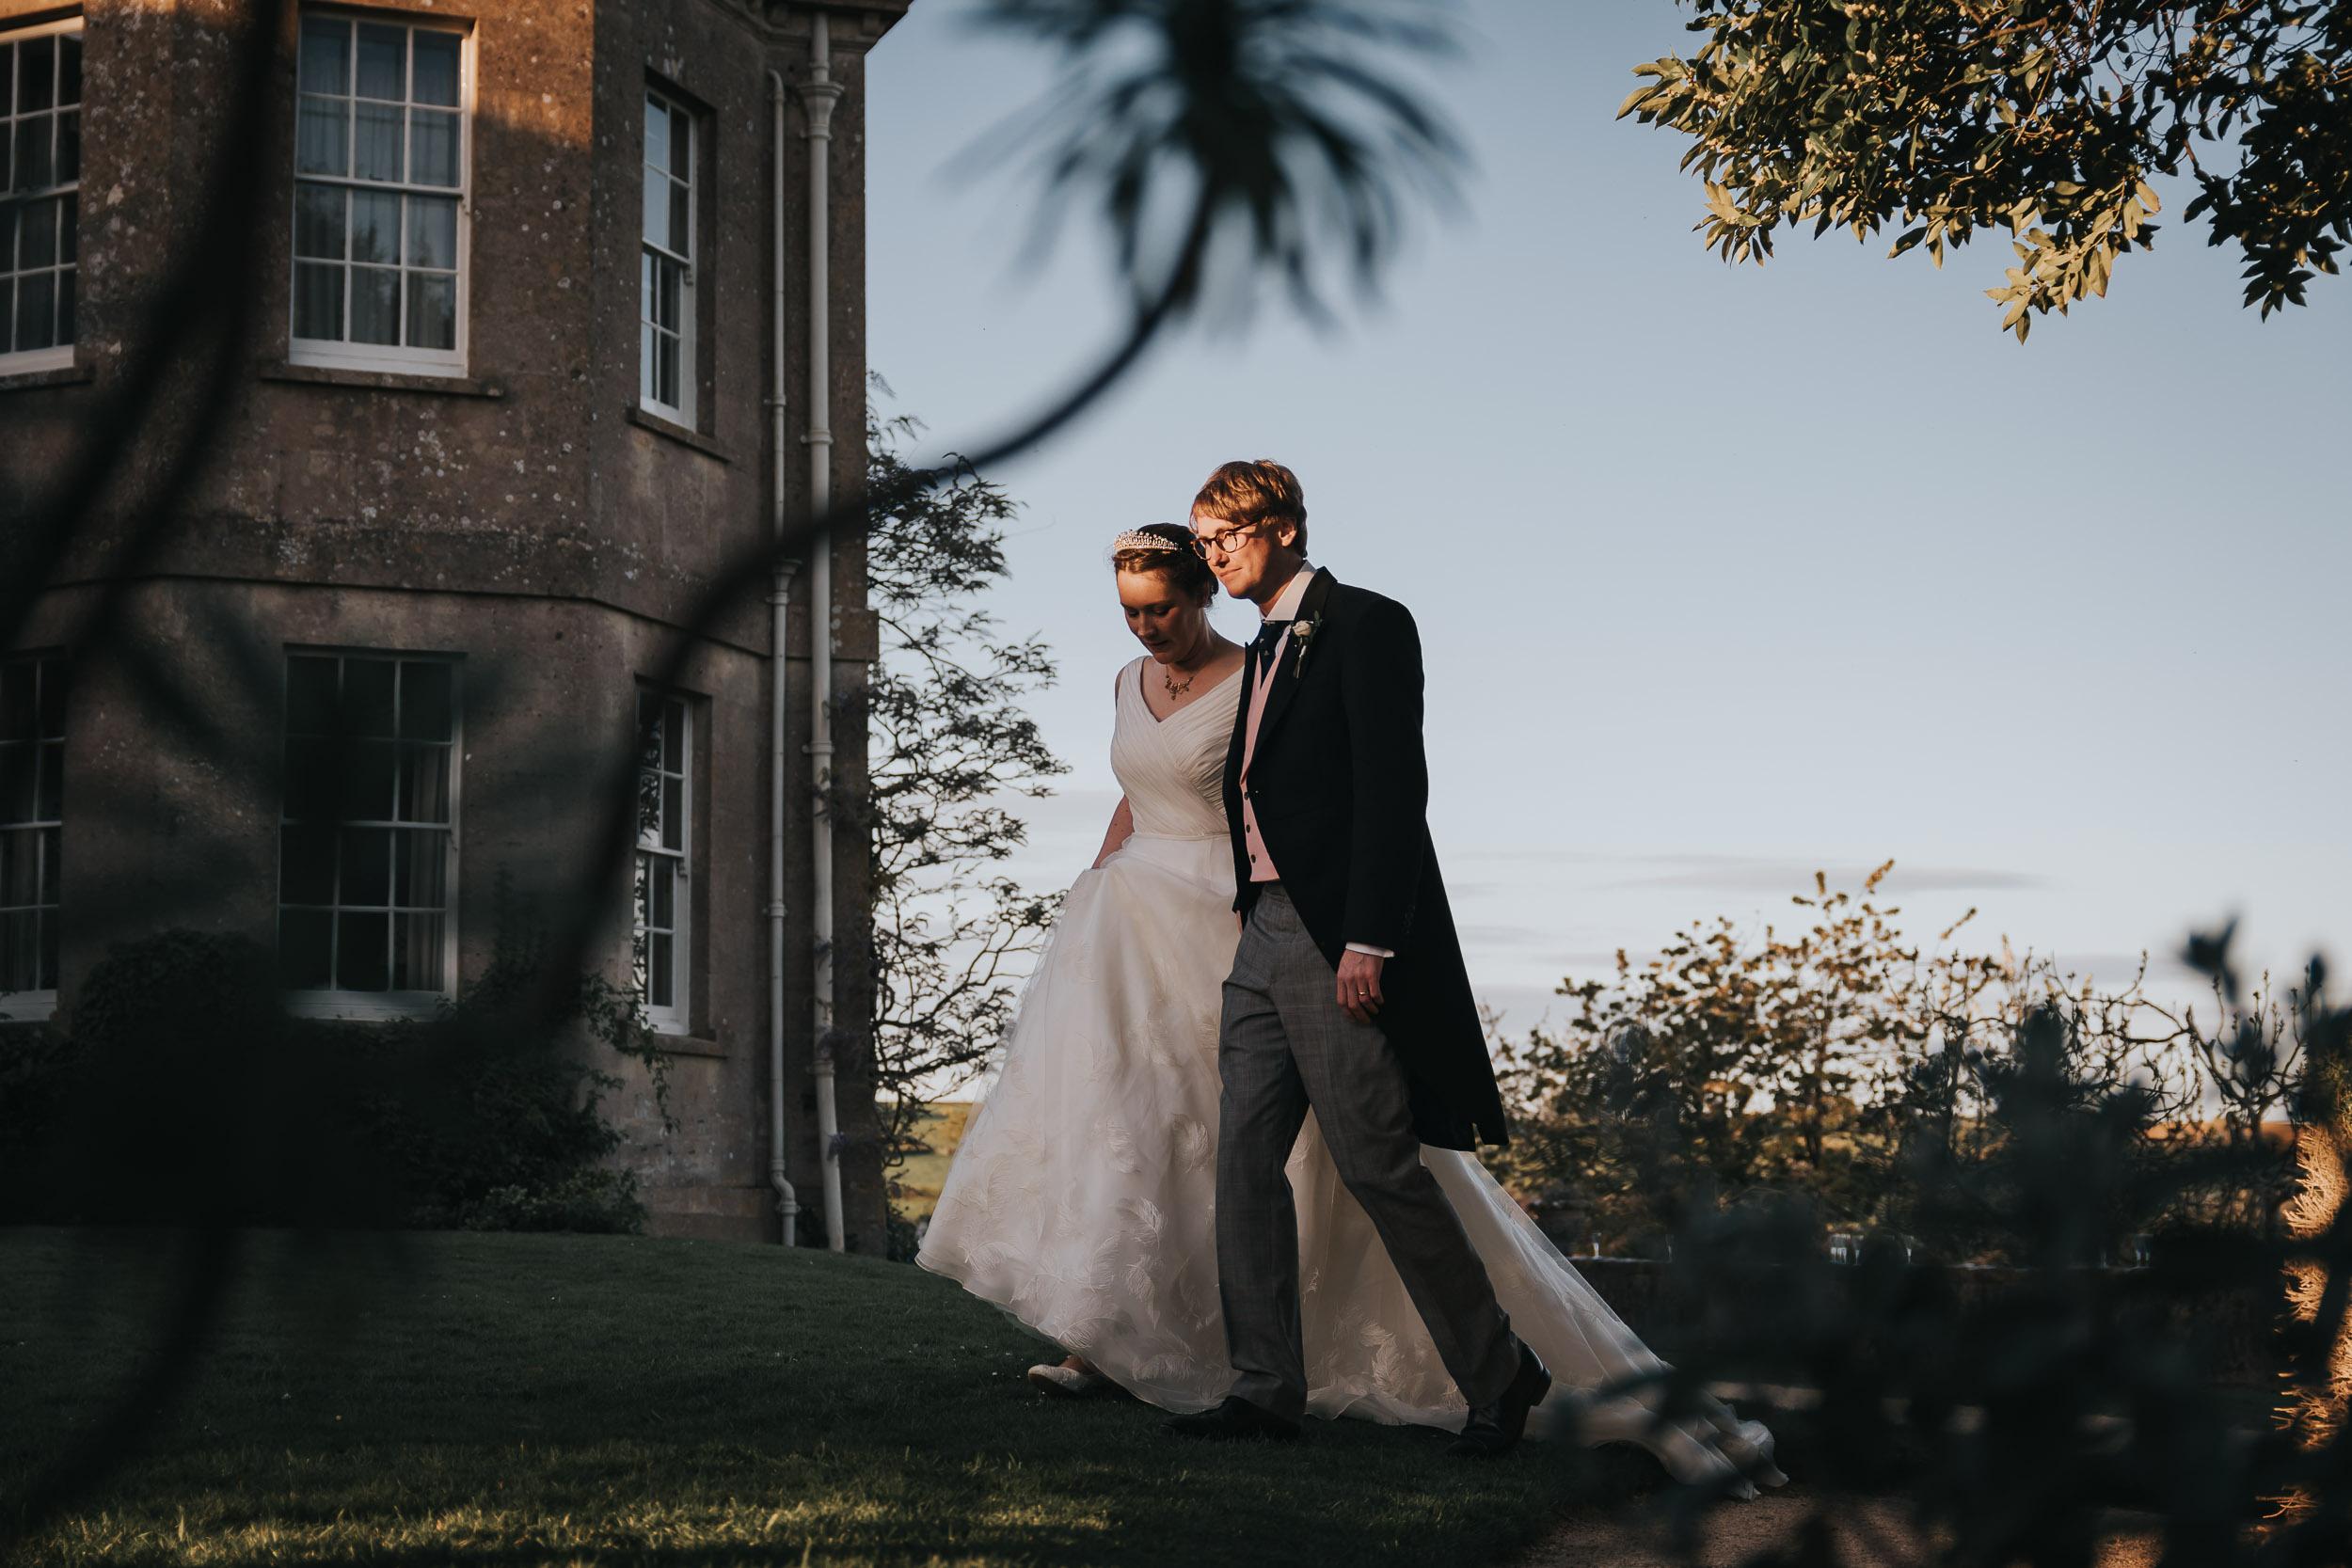 hamswell-house-wedding-photographer-w110.jpg